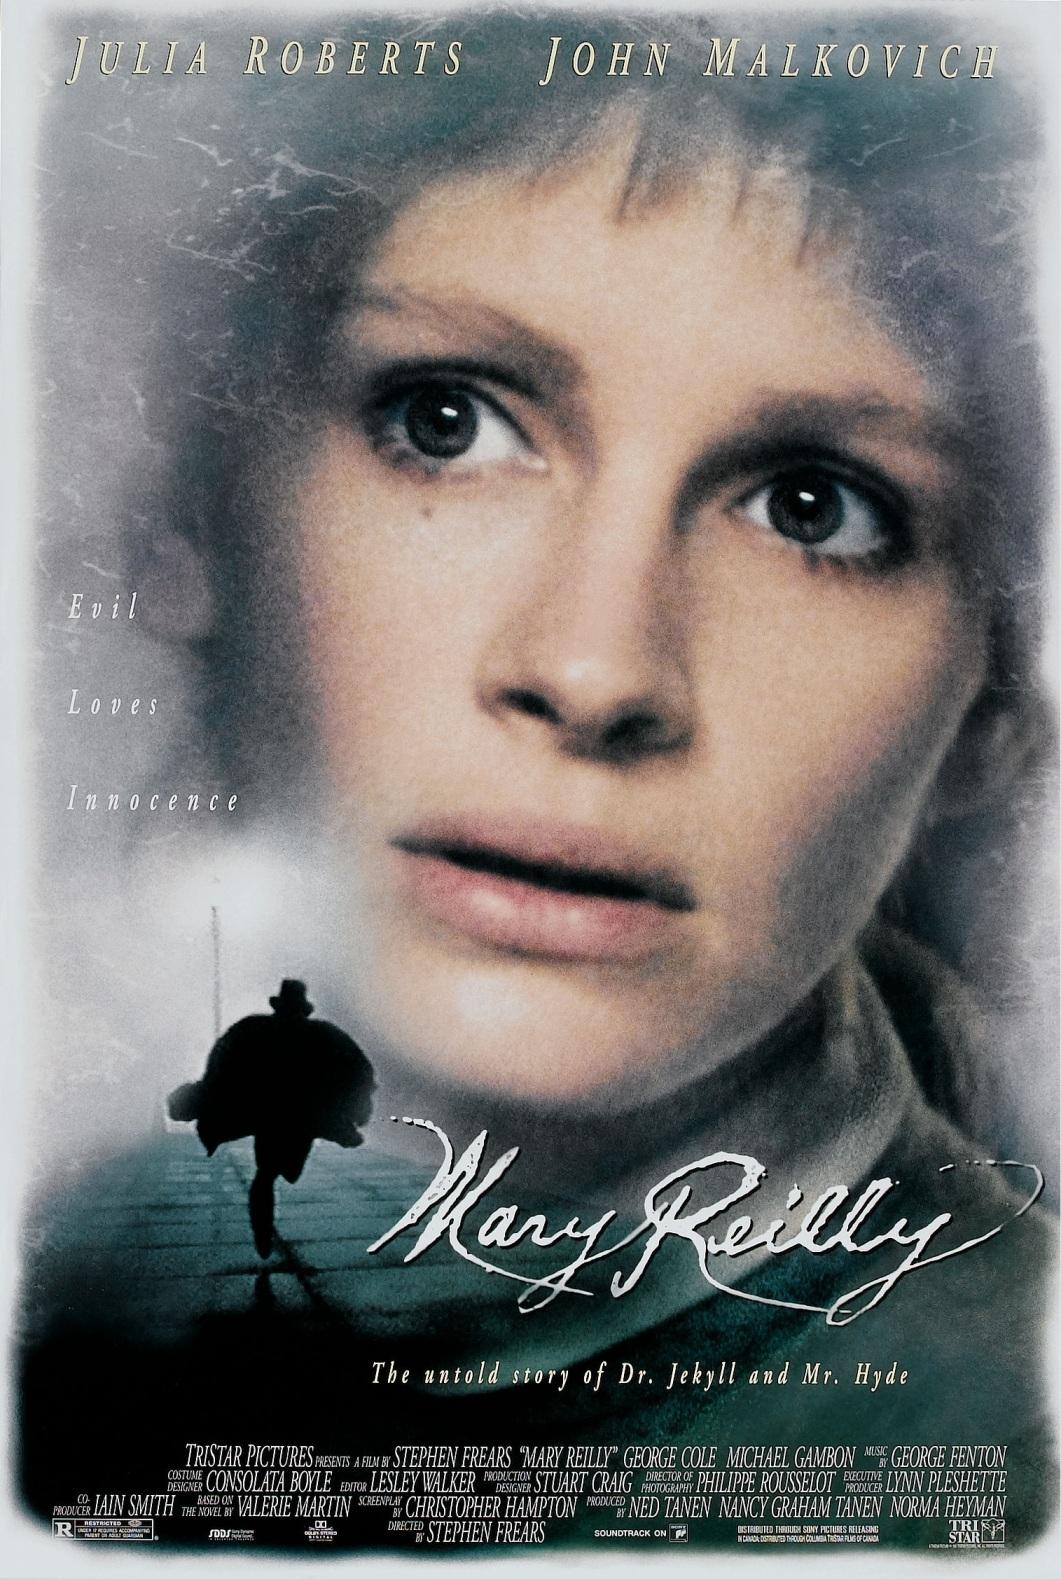 http://1.bp.blogspot.com/-rn0OA9Fr1SU/UIkorgNSAoI/AAAAAAAAZ-Y/PZXJOROf3o8/s1600/Mary+Reilly+(1996).jpg